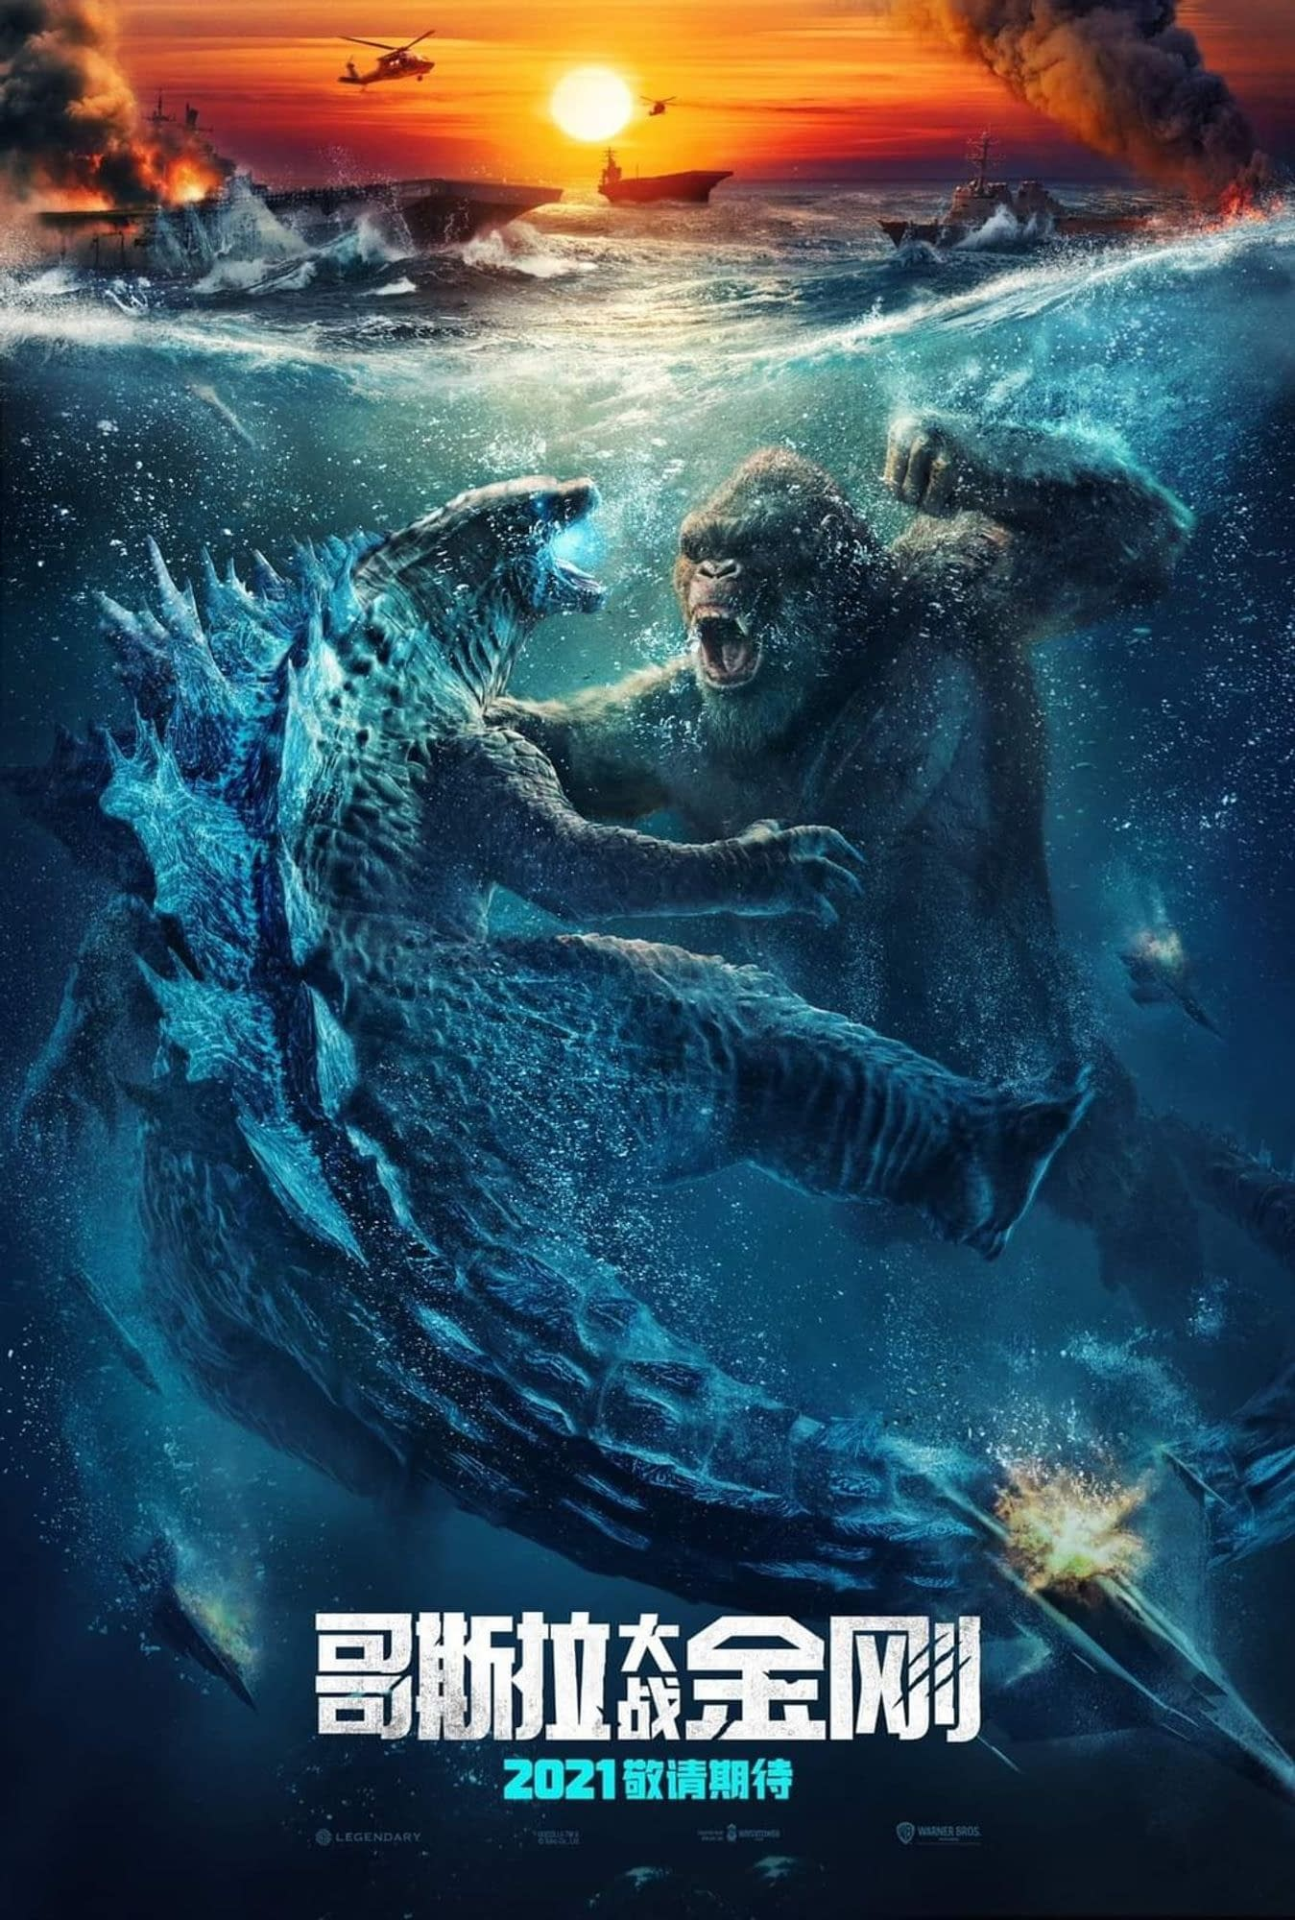 The New Godzilla vs. Kong International Poster is Very Punchy